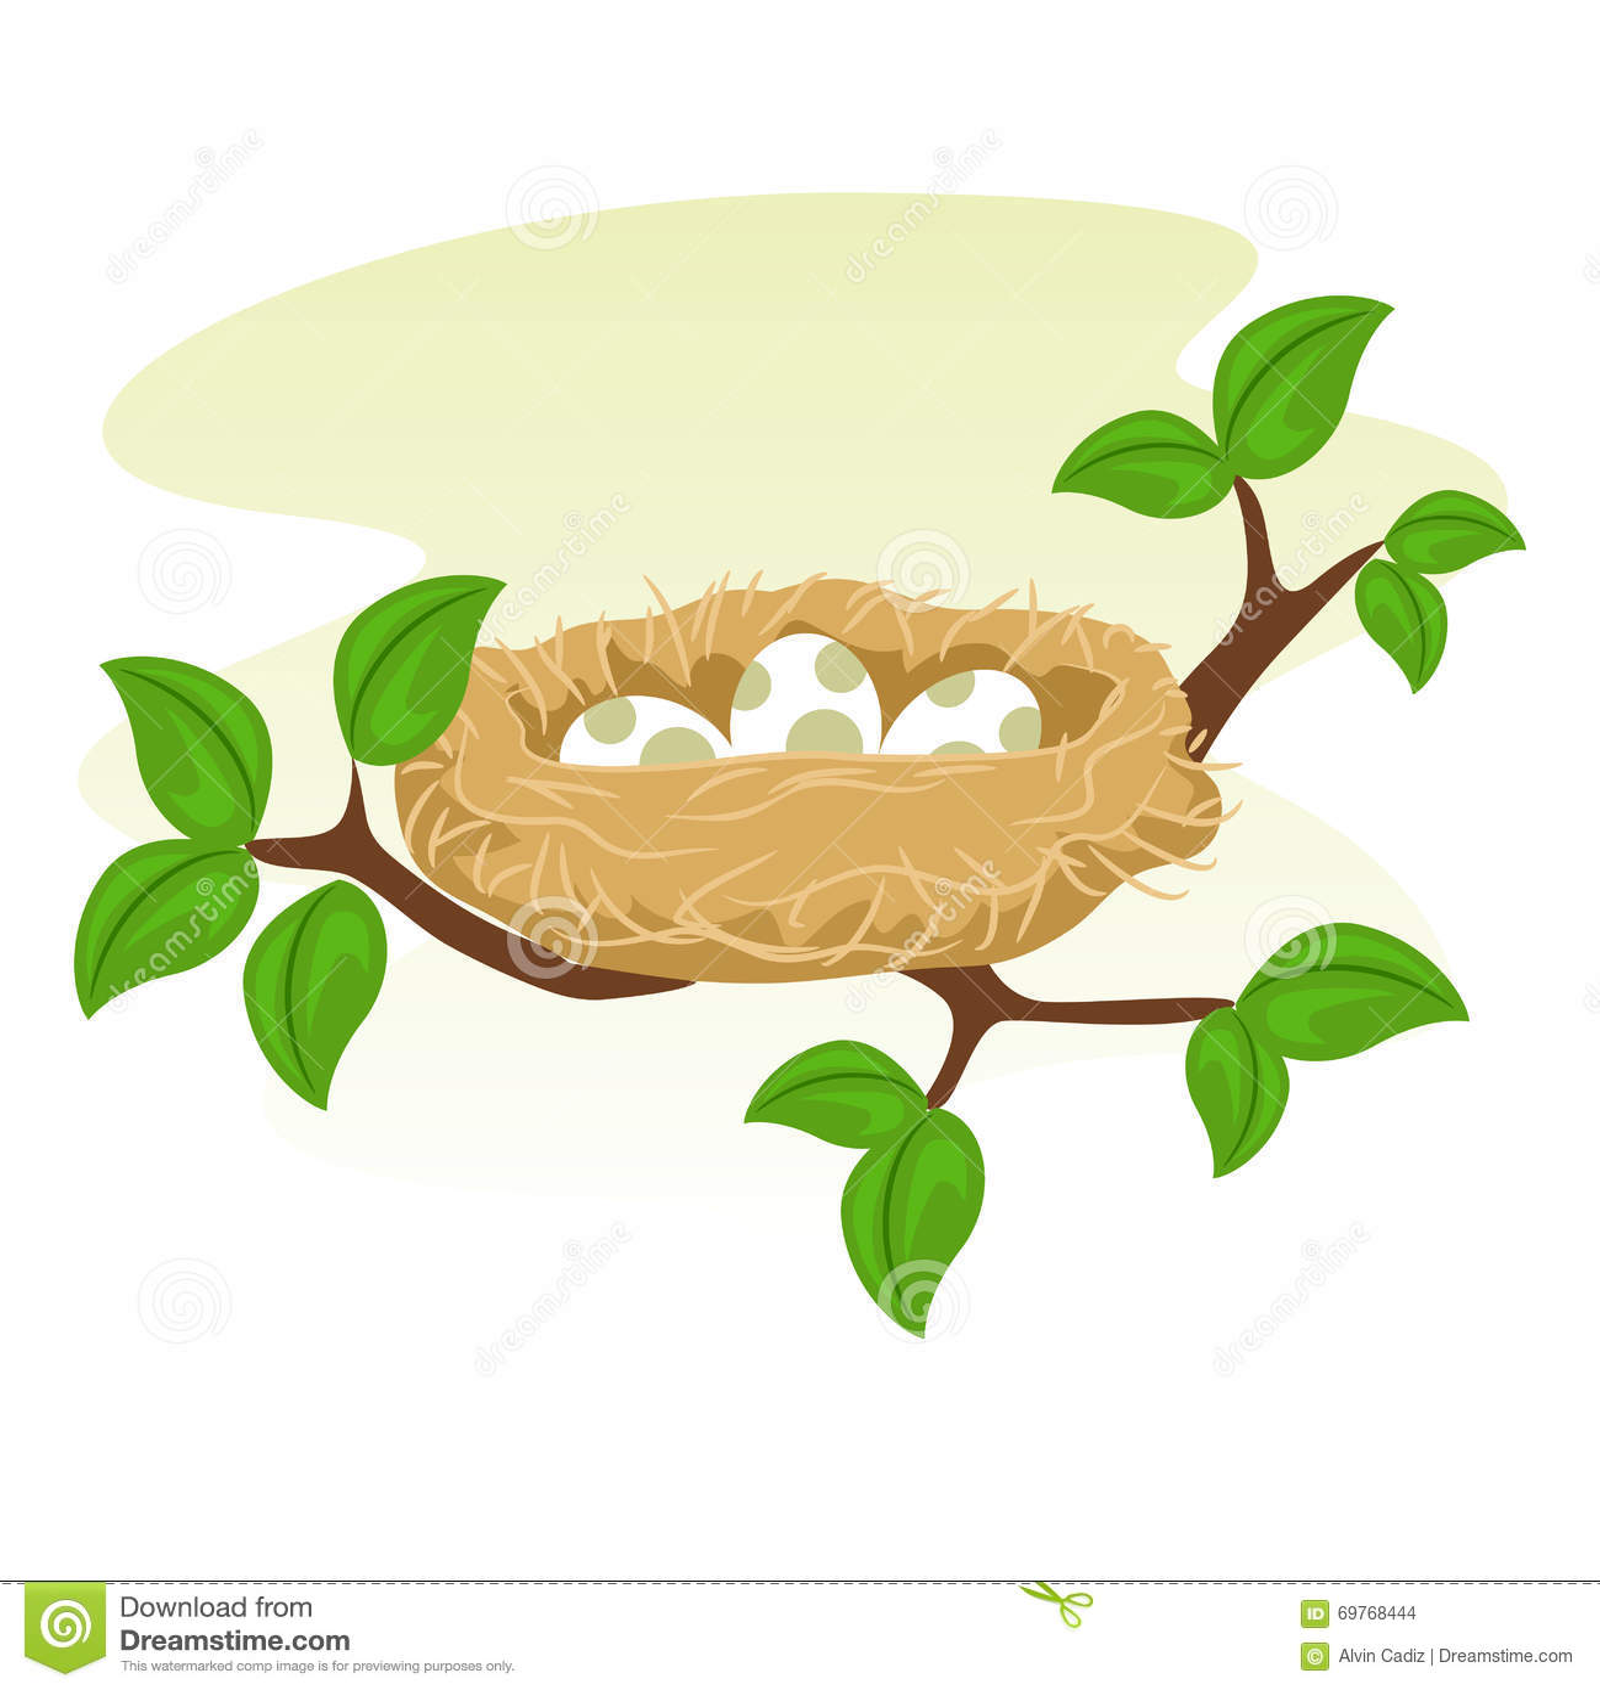 birds nest and egg on tree branch stock vector image free cartoon bird clipart cartoon bird clip art transparent